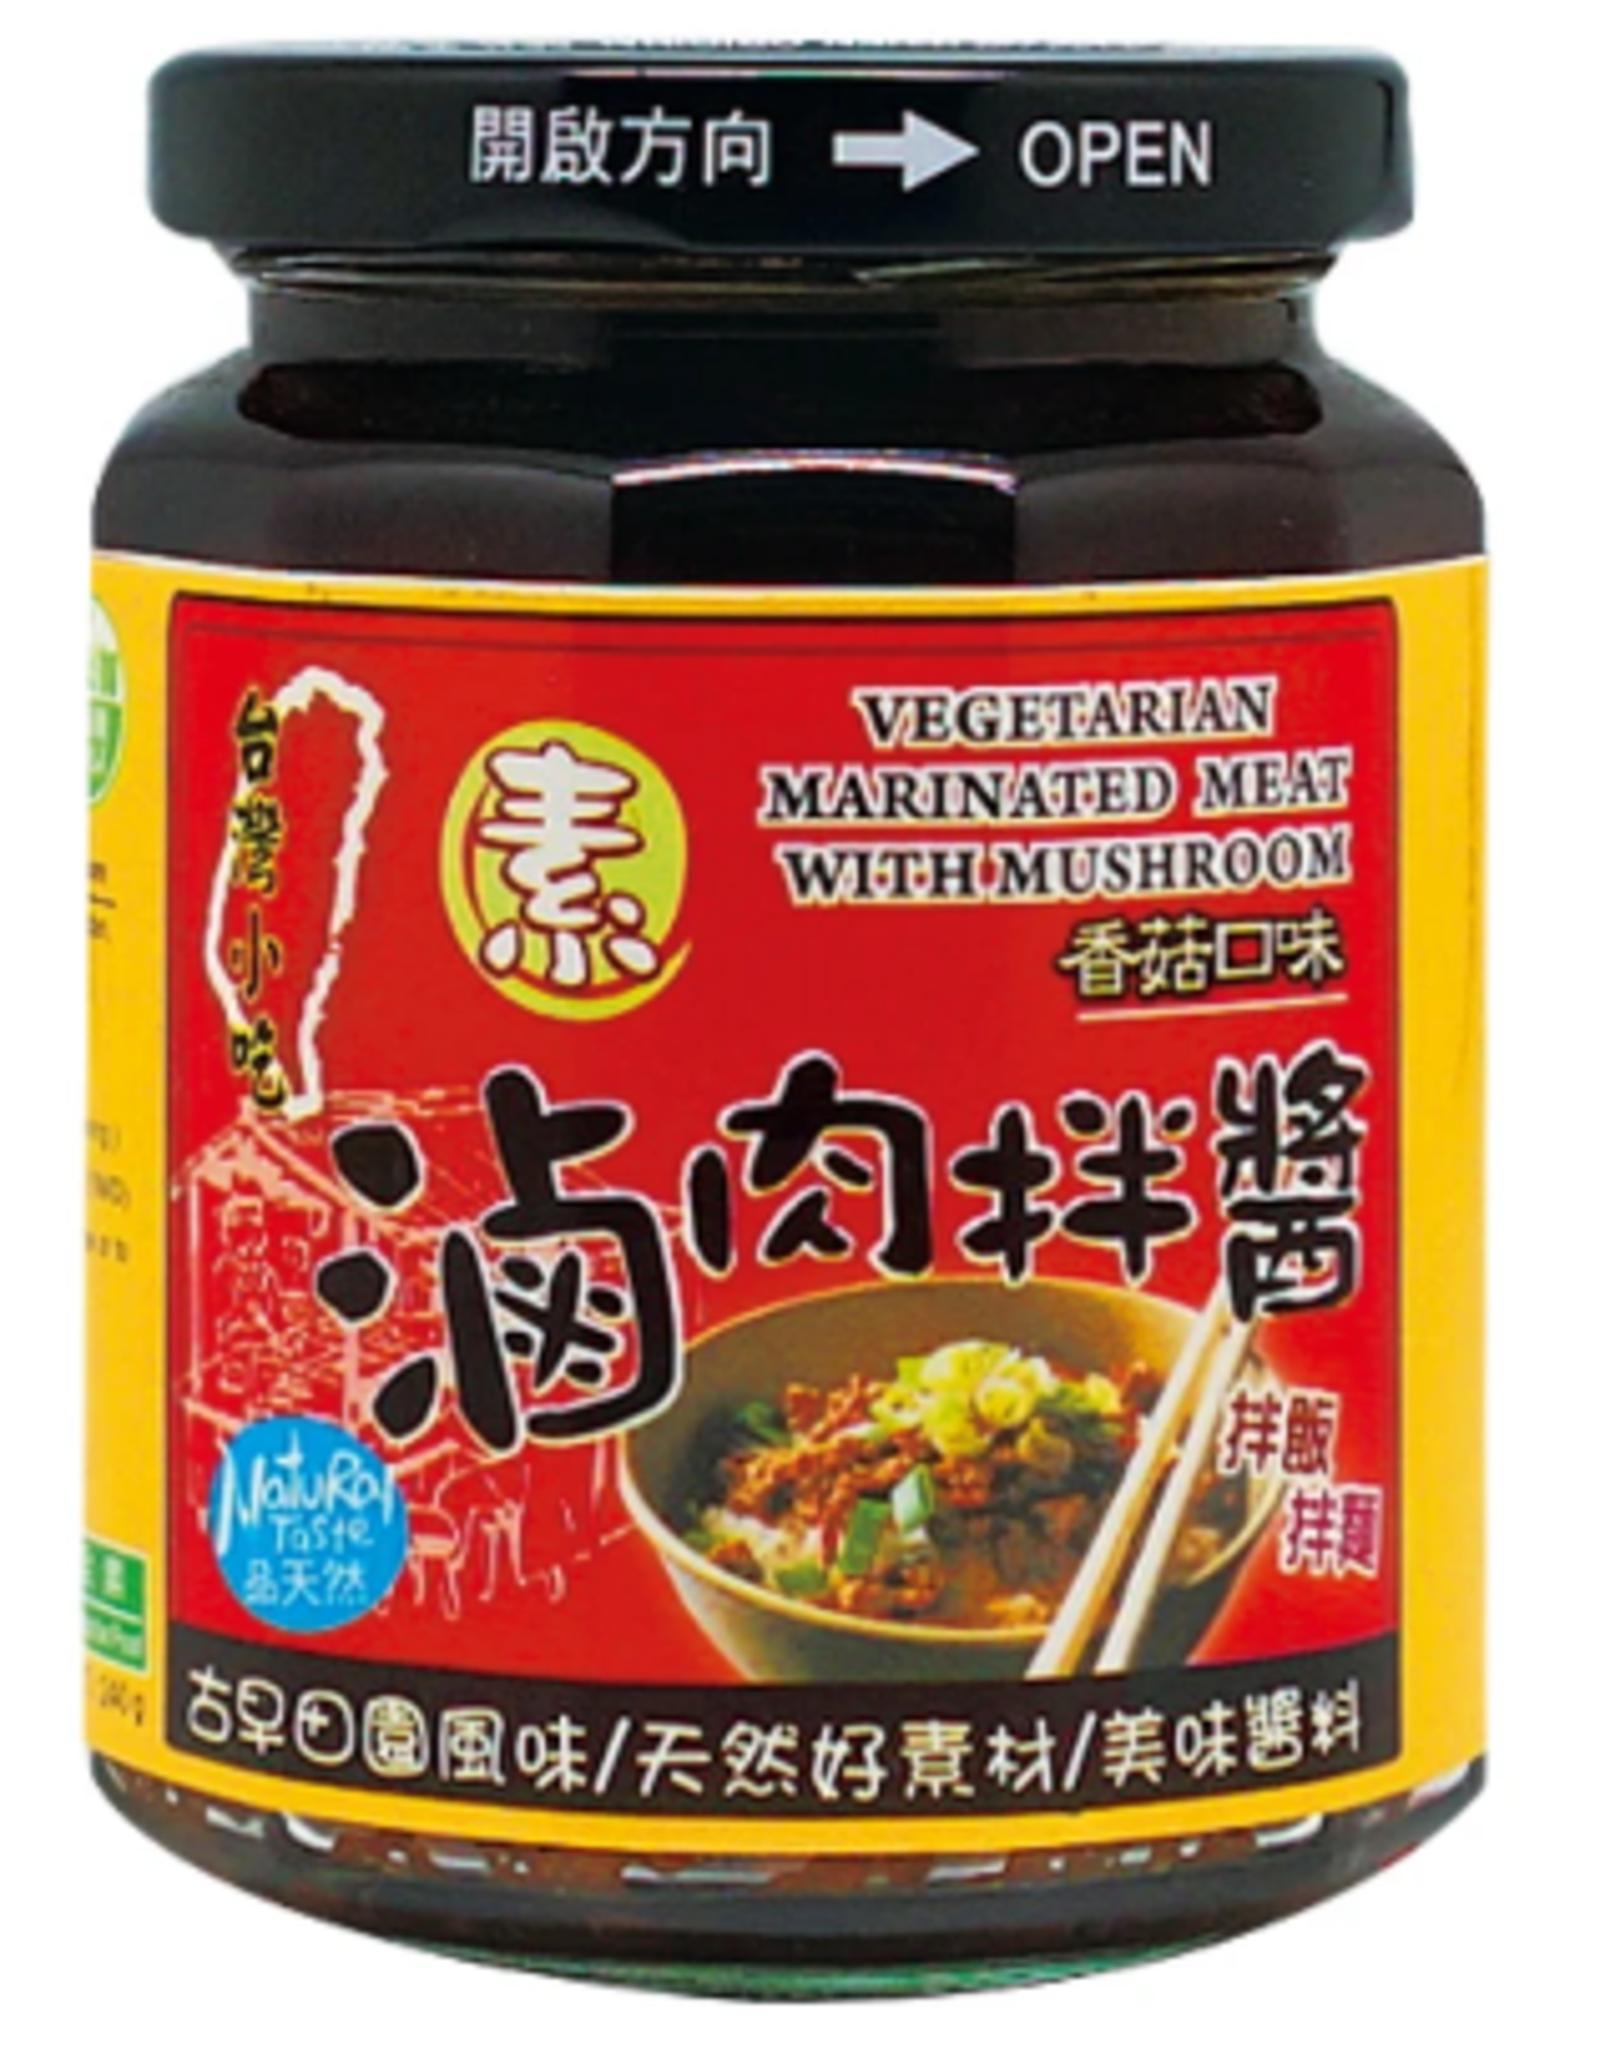 (UK) Vege SauceCo Vege Marshroom Marinated Pork Sauce*(味榮) 素滷肉拌醬